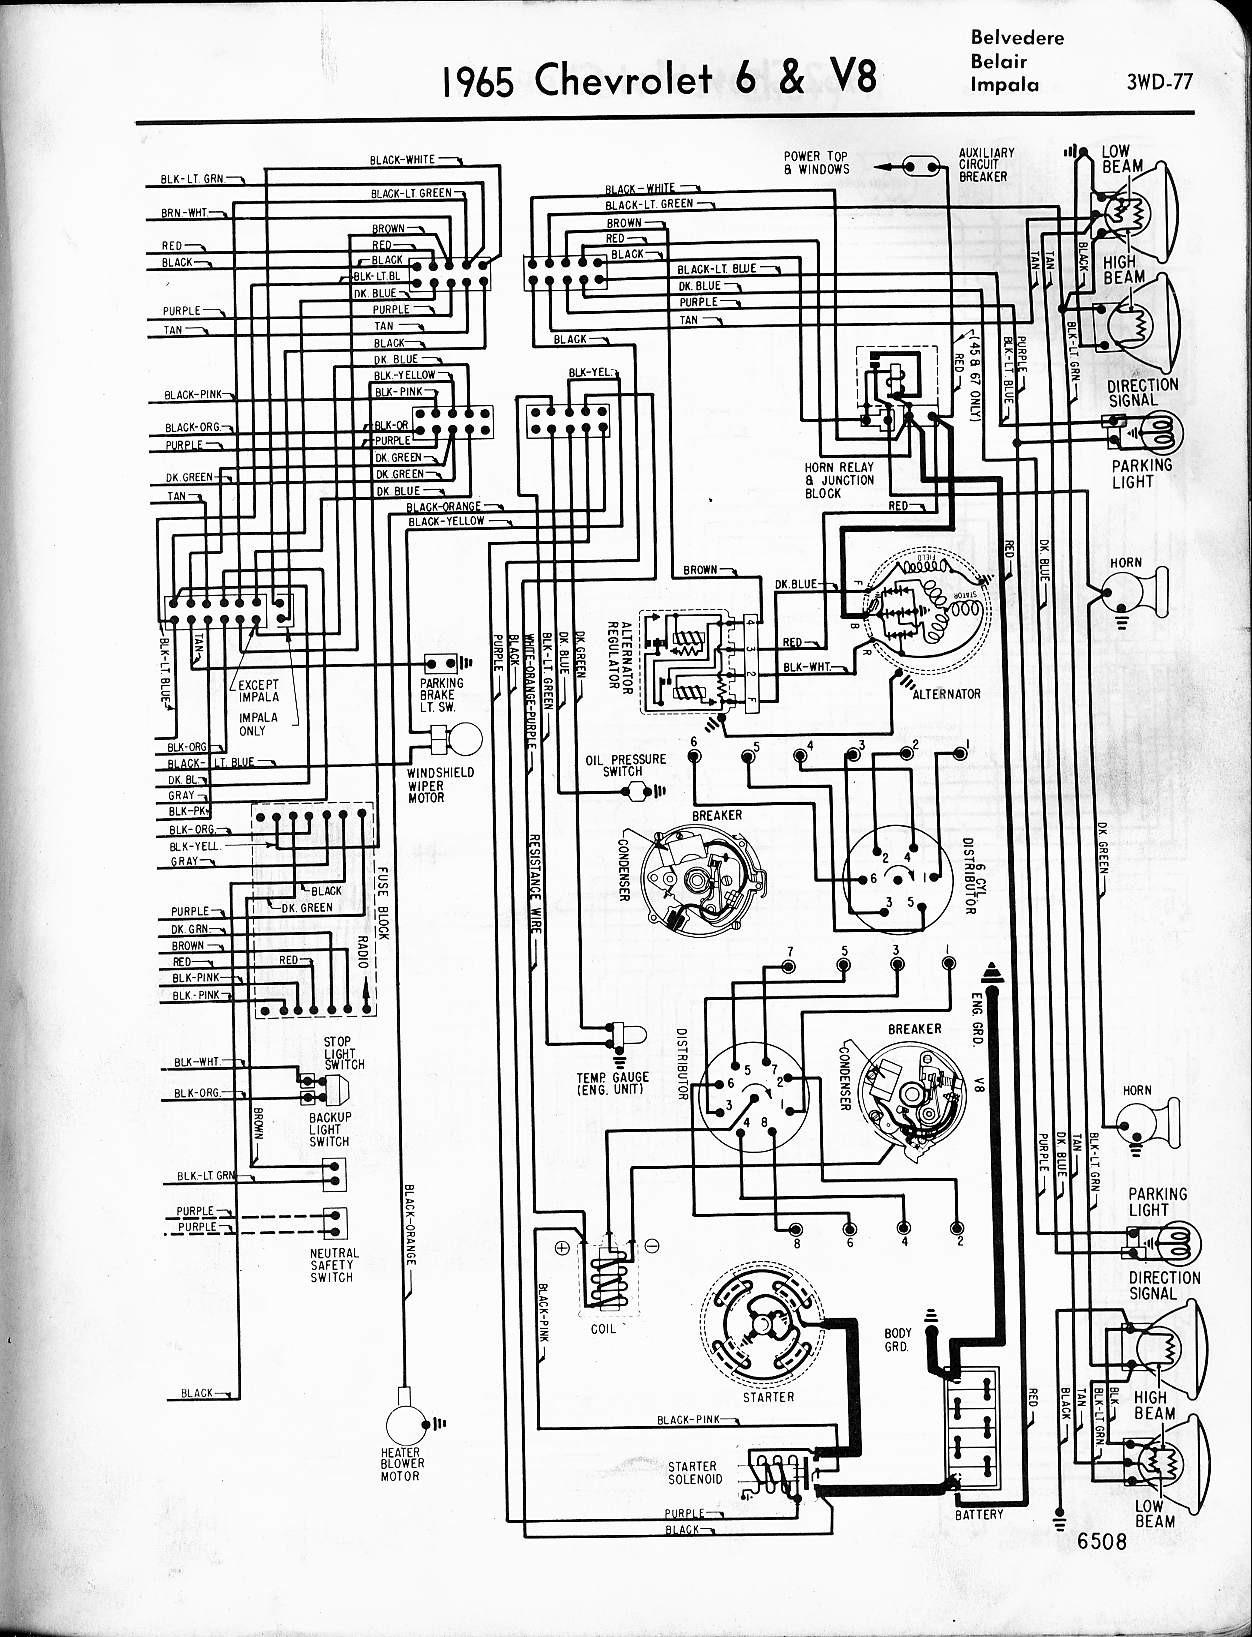 2000 chevy impala 3 4 engine diagram diagram 2011 chevy impala thermostat  location at 2000 chevy